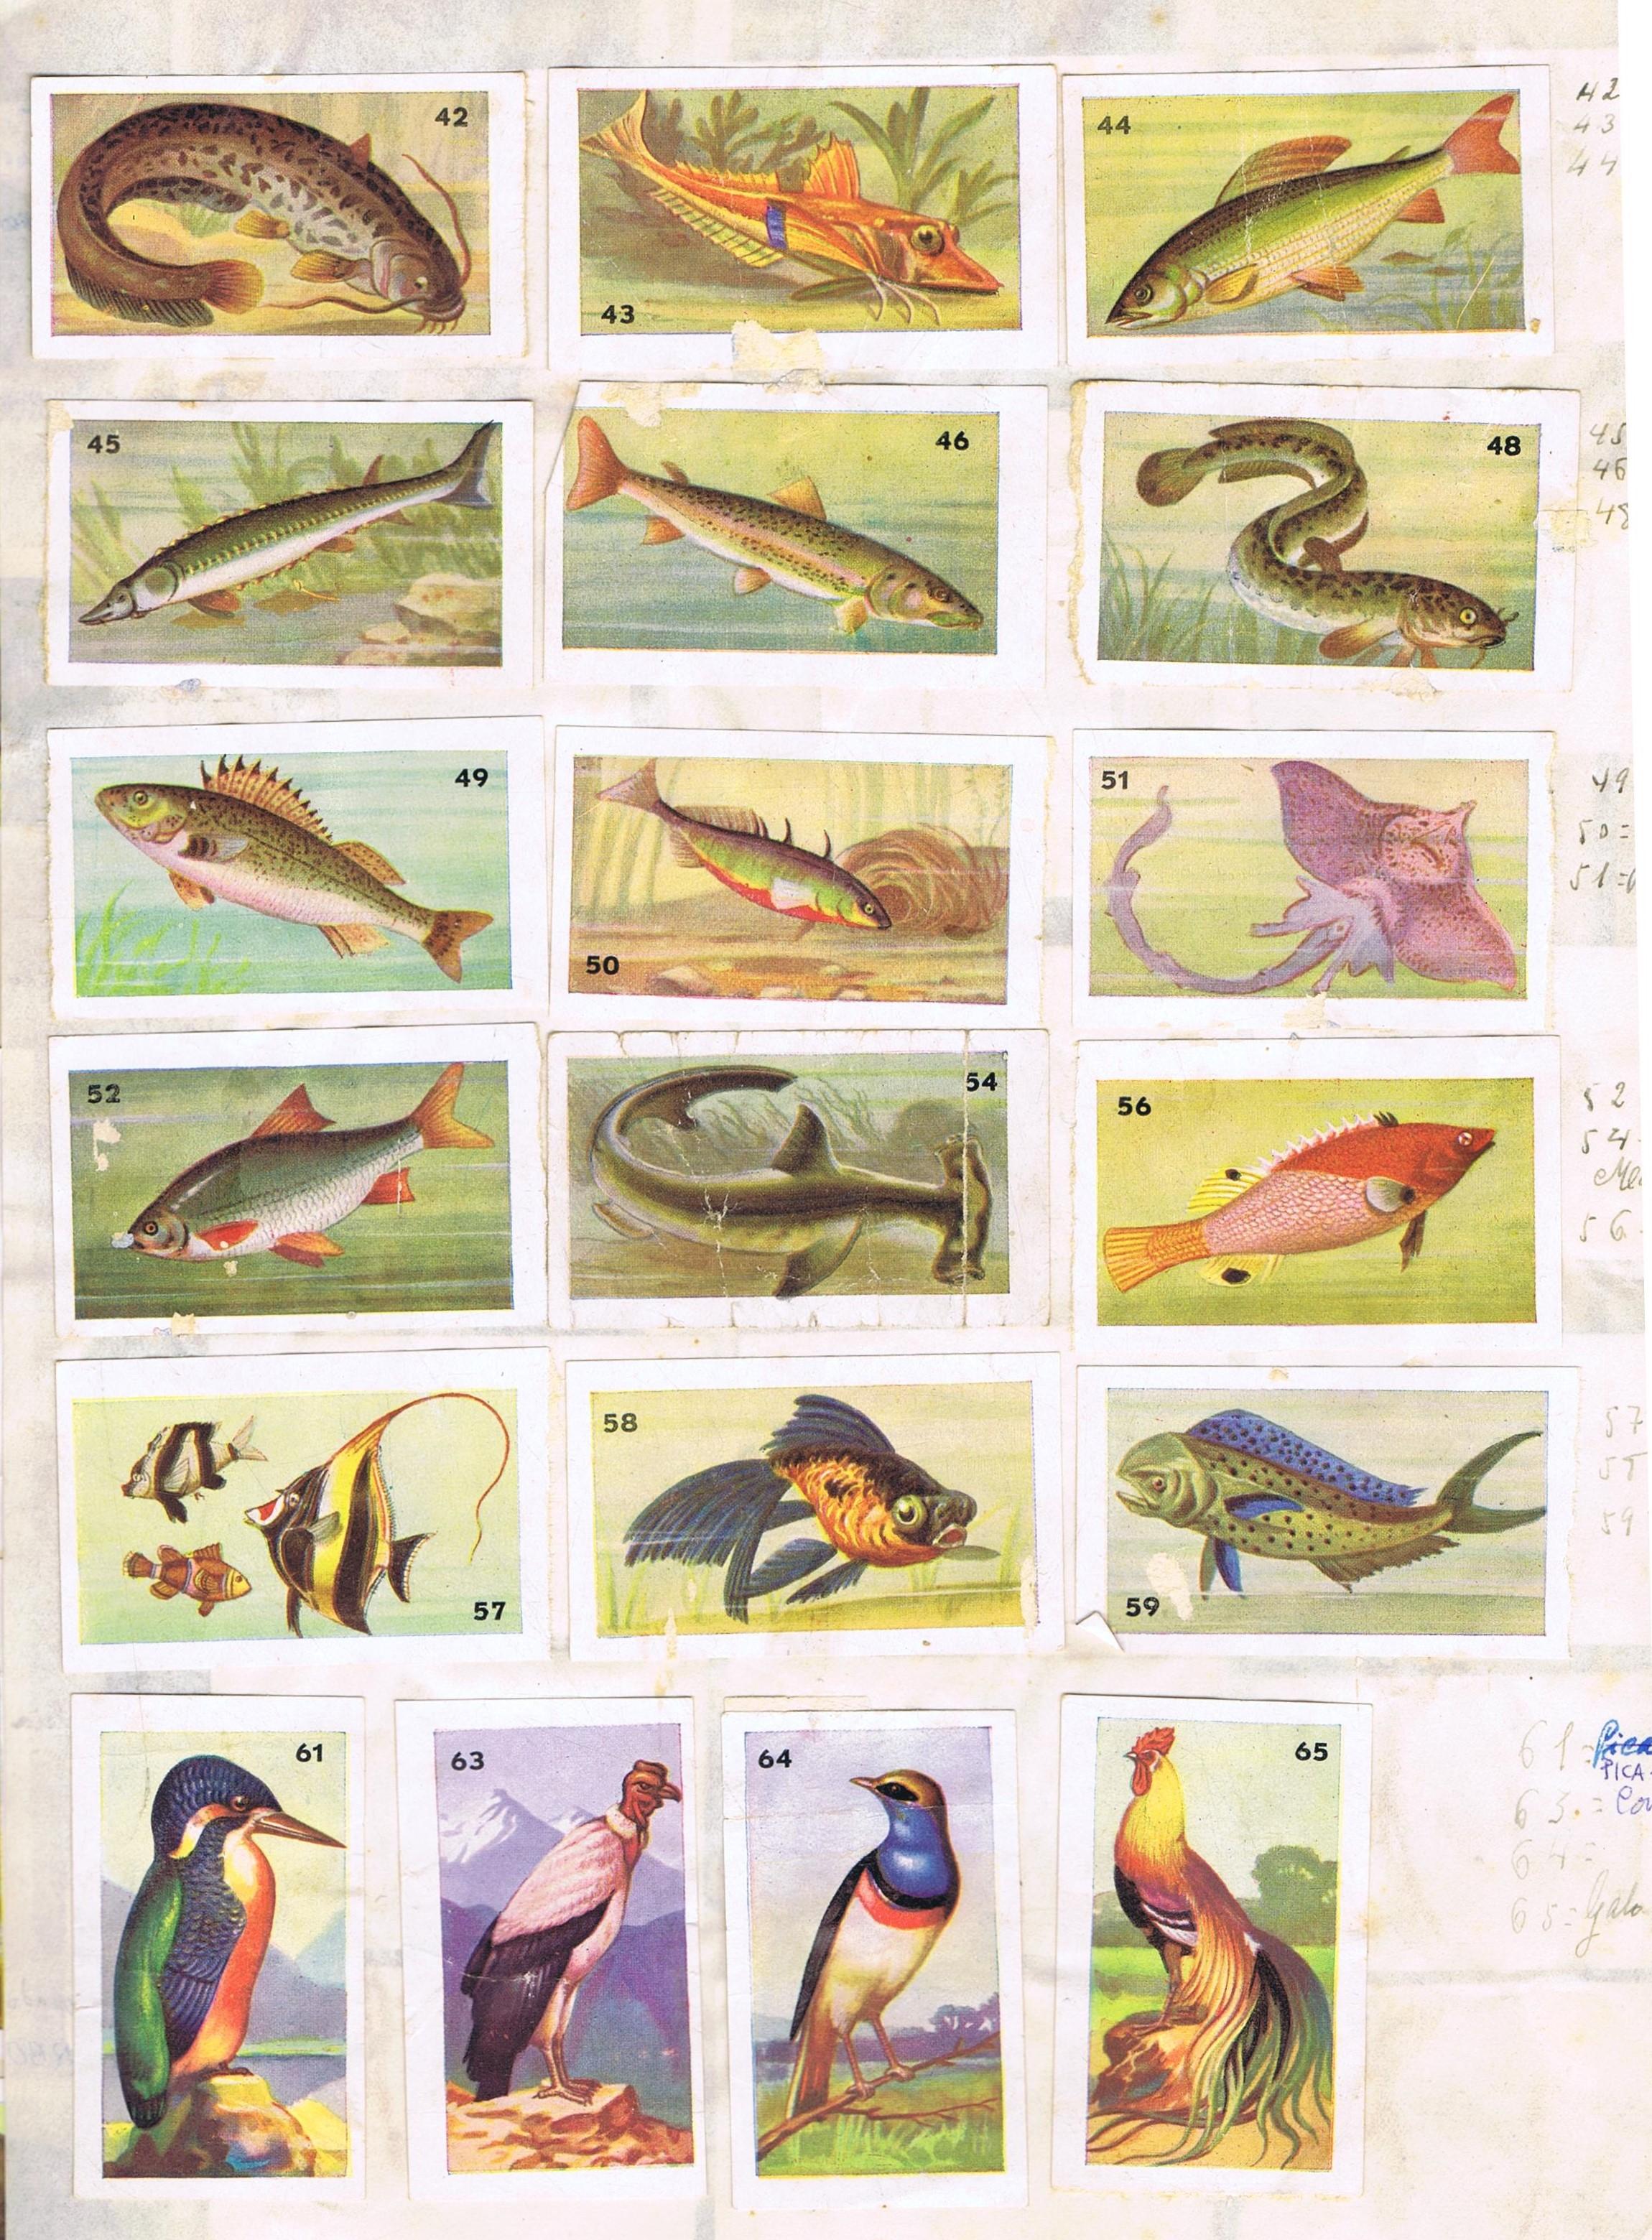 atlas de zoologia 4